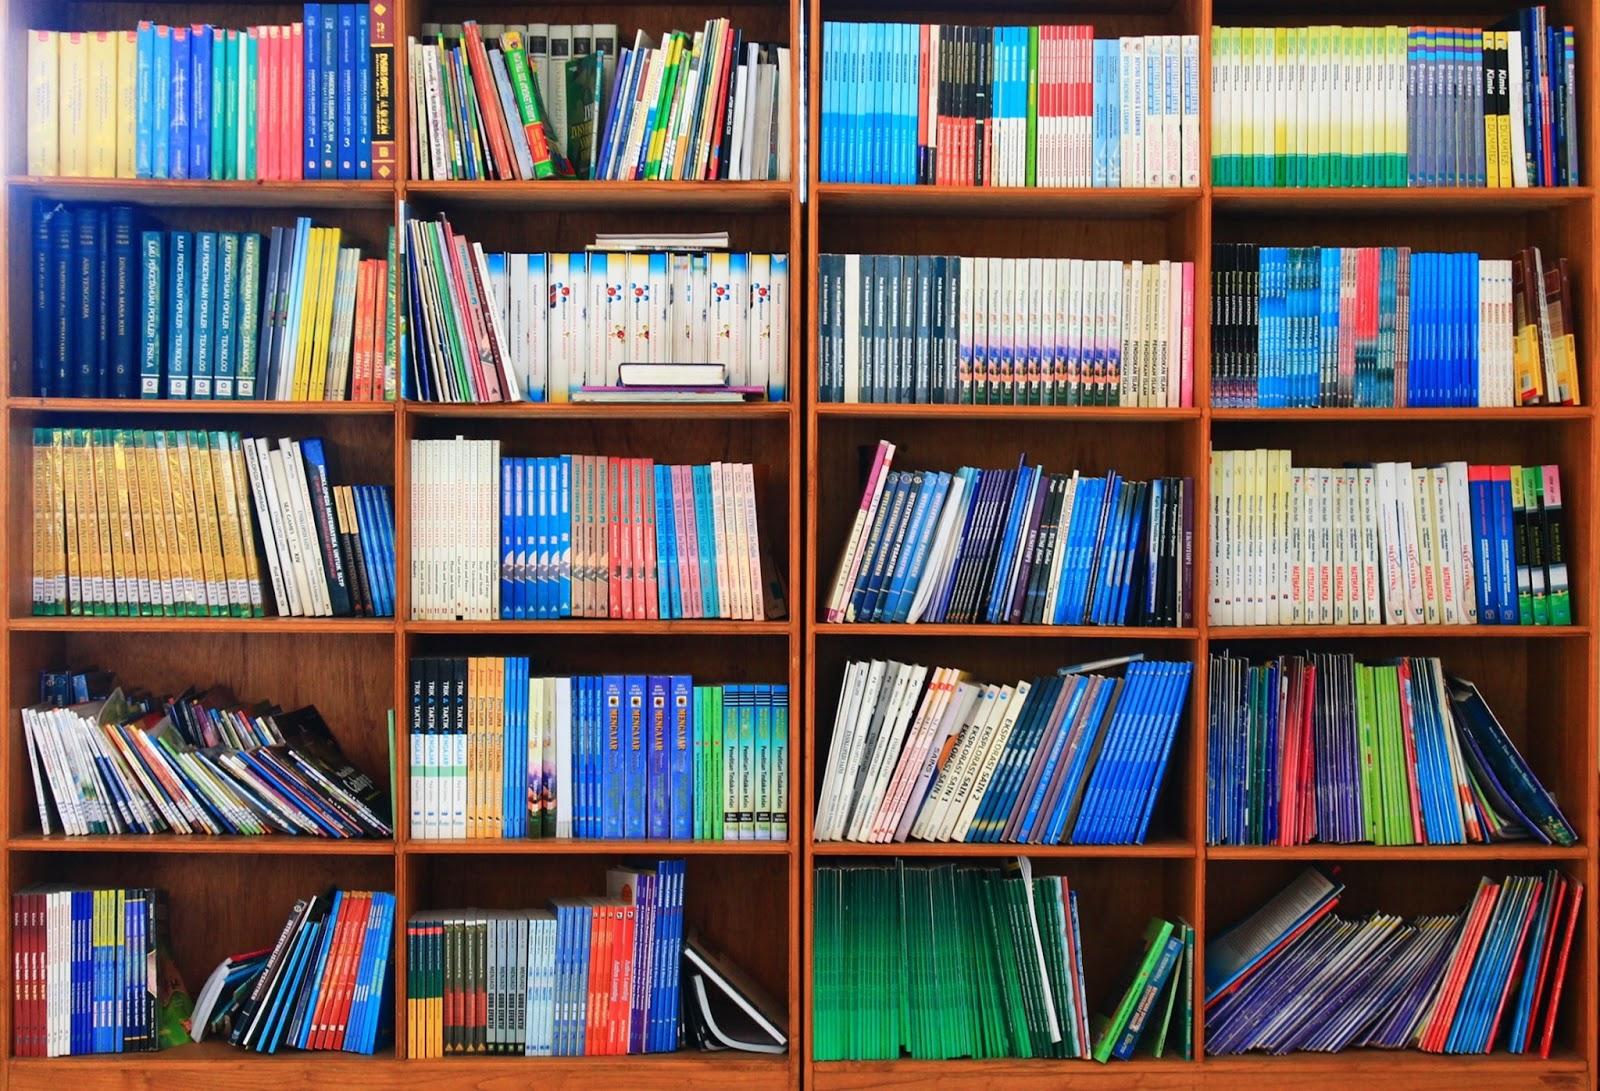 buku perpustakaan, jual buku perpustakaan sma, buku pengayaan sma, buku dak sma 2017, dak sma 2017, buku referensi sma,jual buku sma